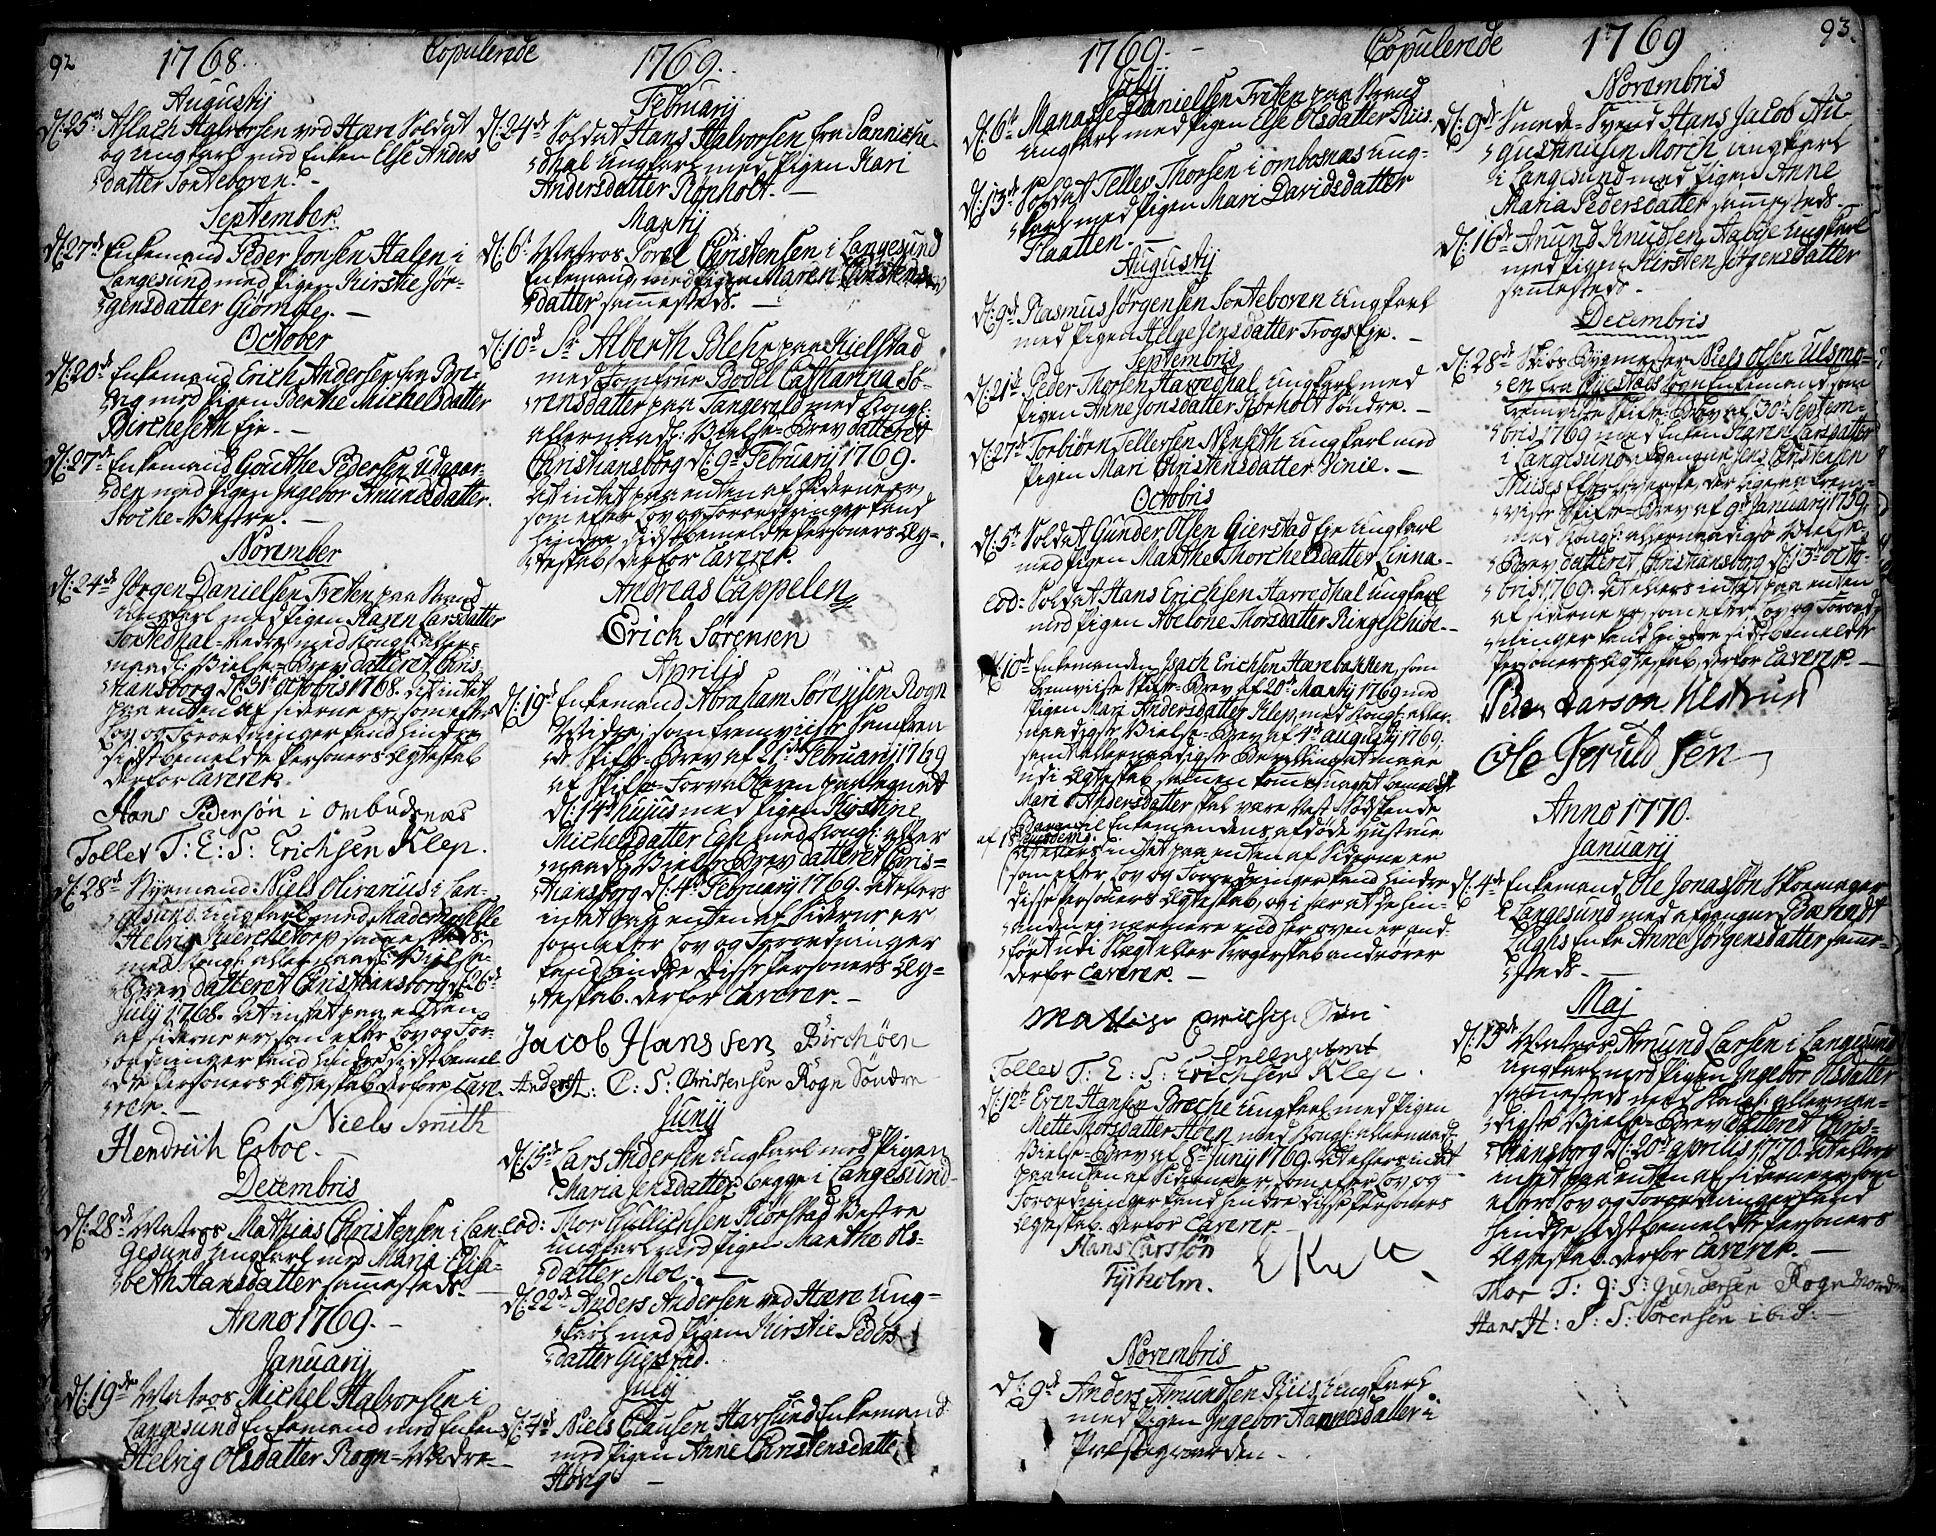 SAKO, Bamble kirkebøker, F/Fa/L0001: Ministerialbok nr. I 1, 1702-1774, s. 92-93